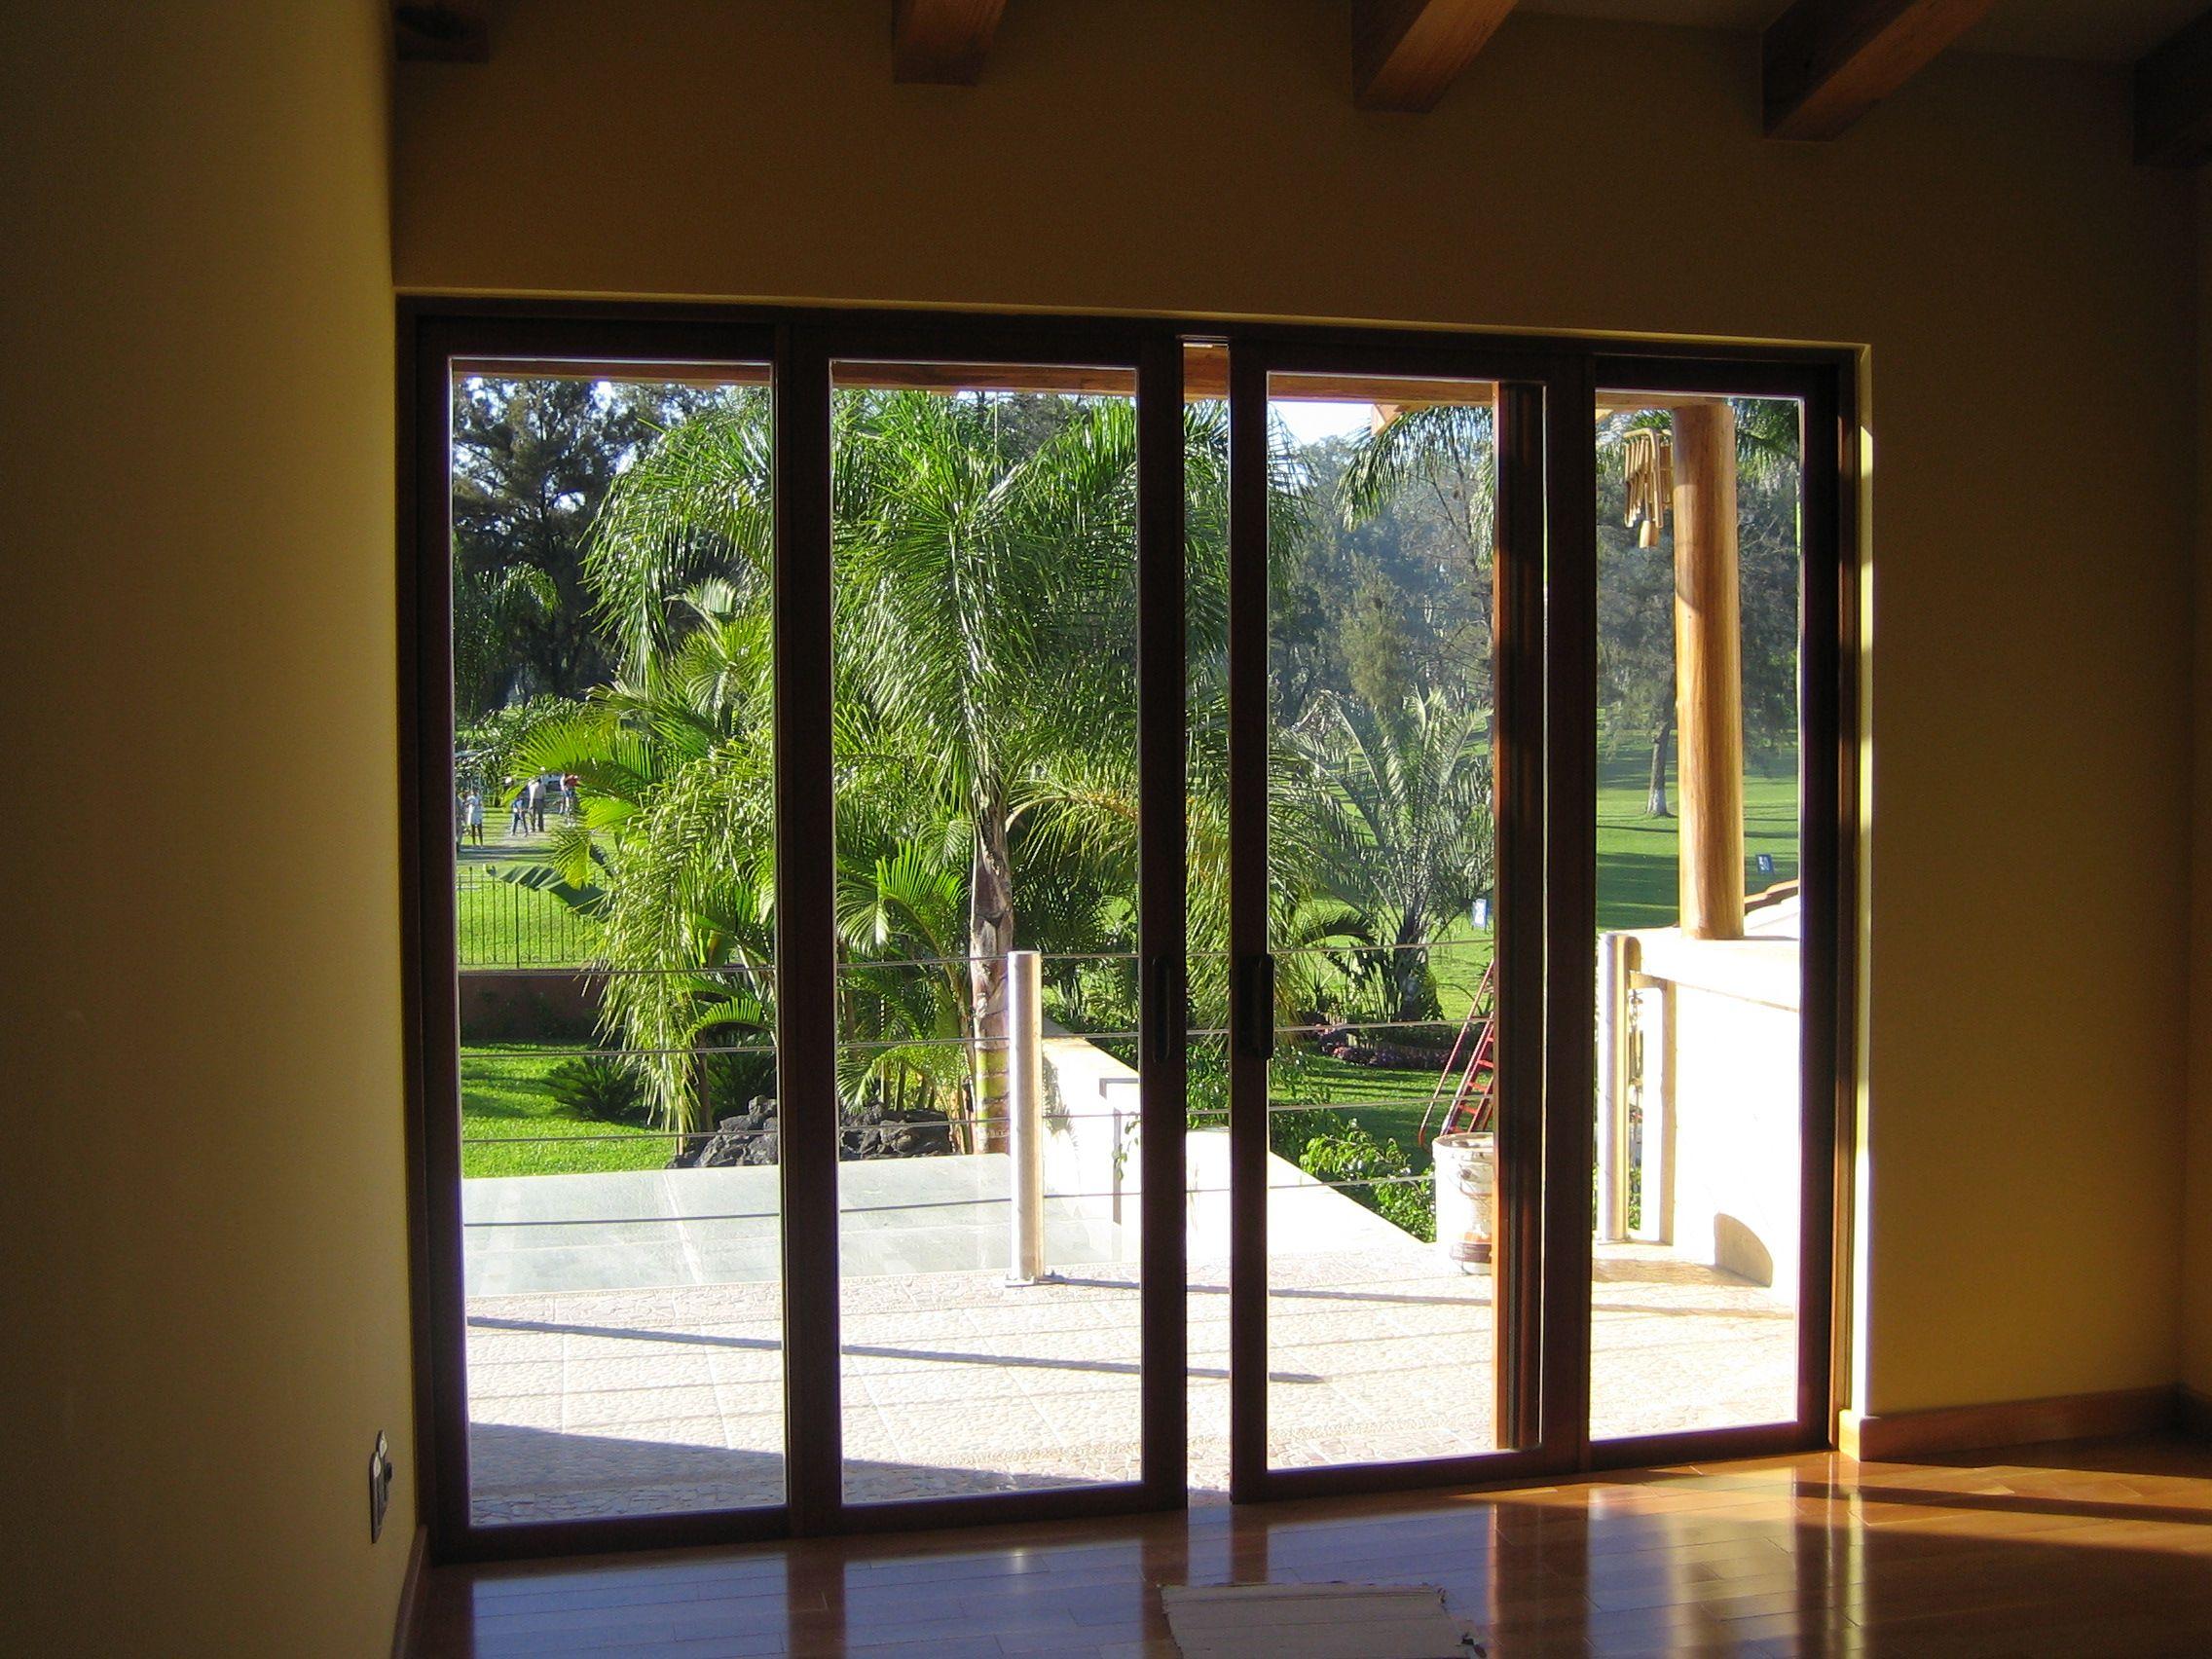 Puertas corredizas de madera ventana ventanademadera